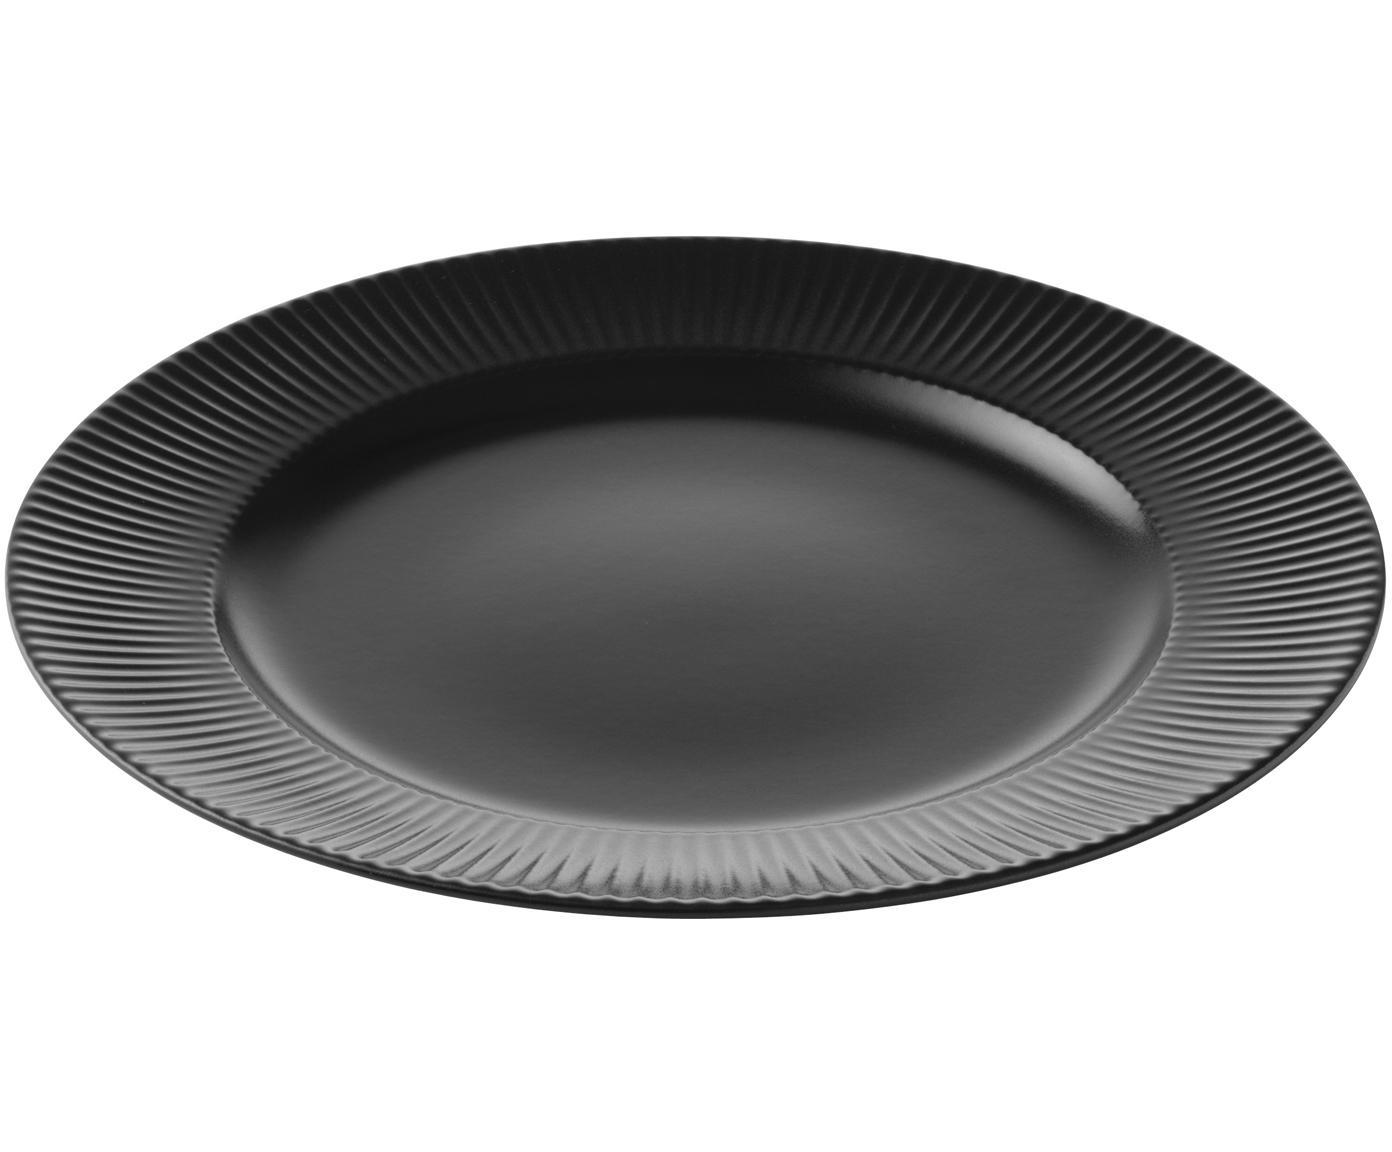 Dinerbord Groove, 4 stuks, Porselein, Zwart, Ø 27 x H 1 cm